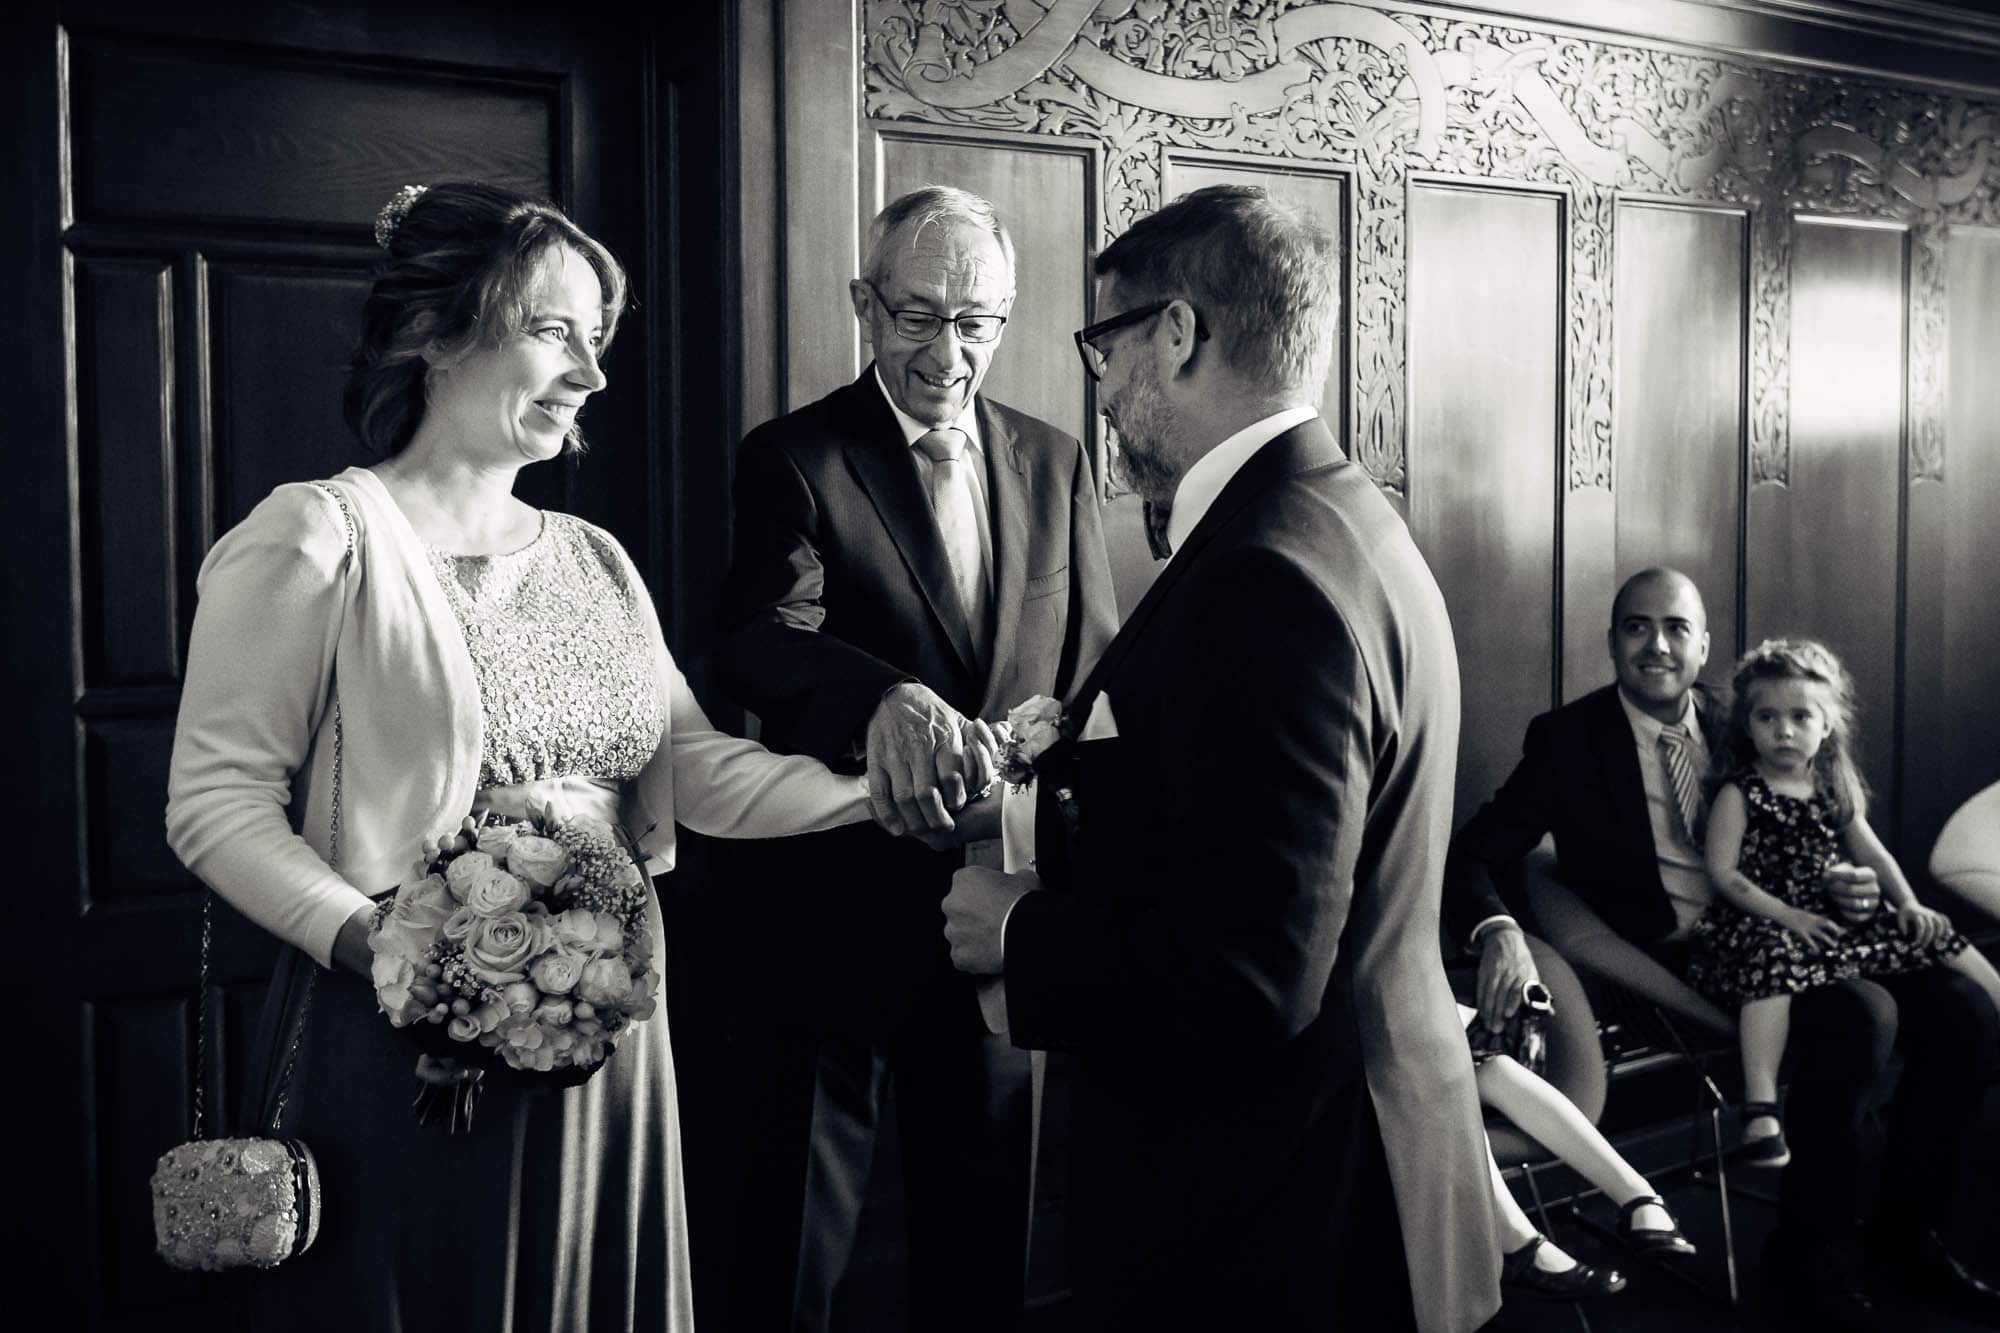 Brautvater übergibt Braut dem Bräutigam